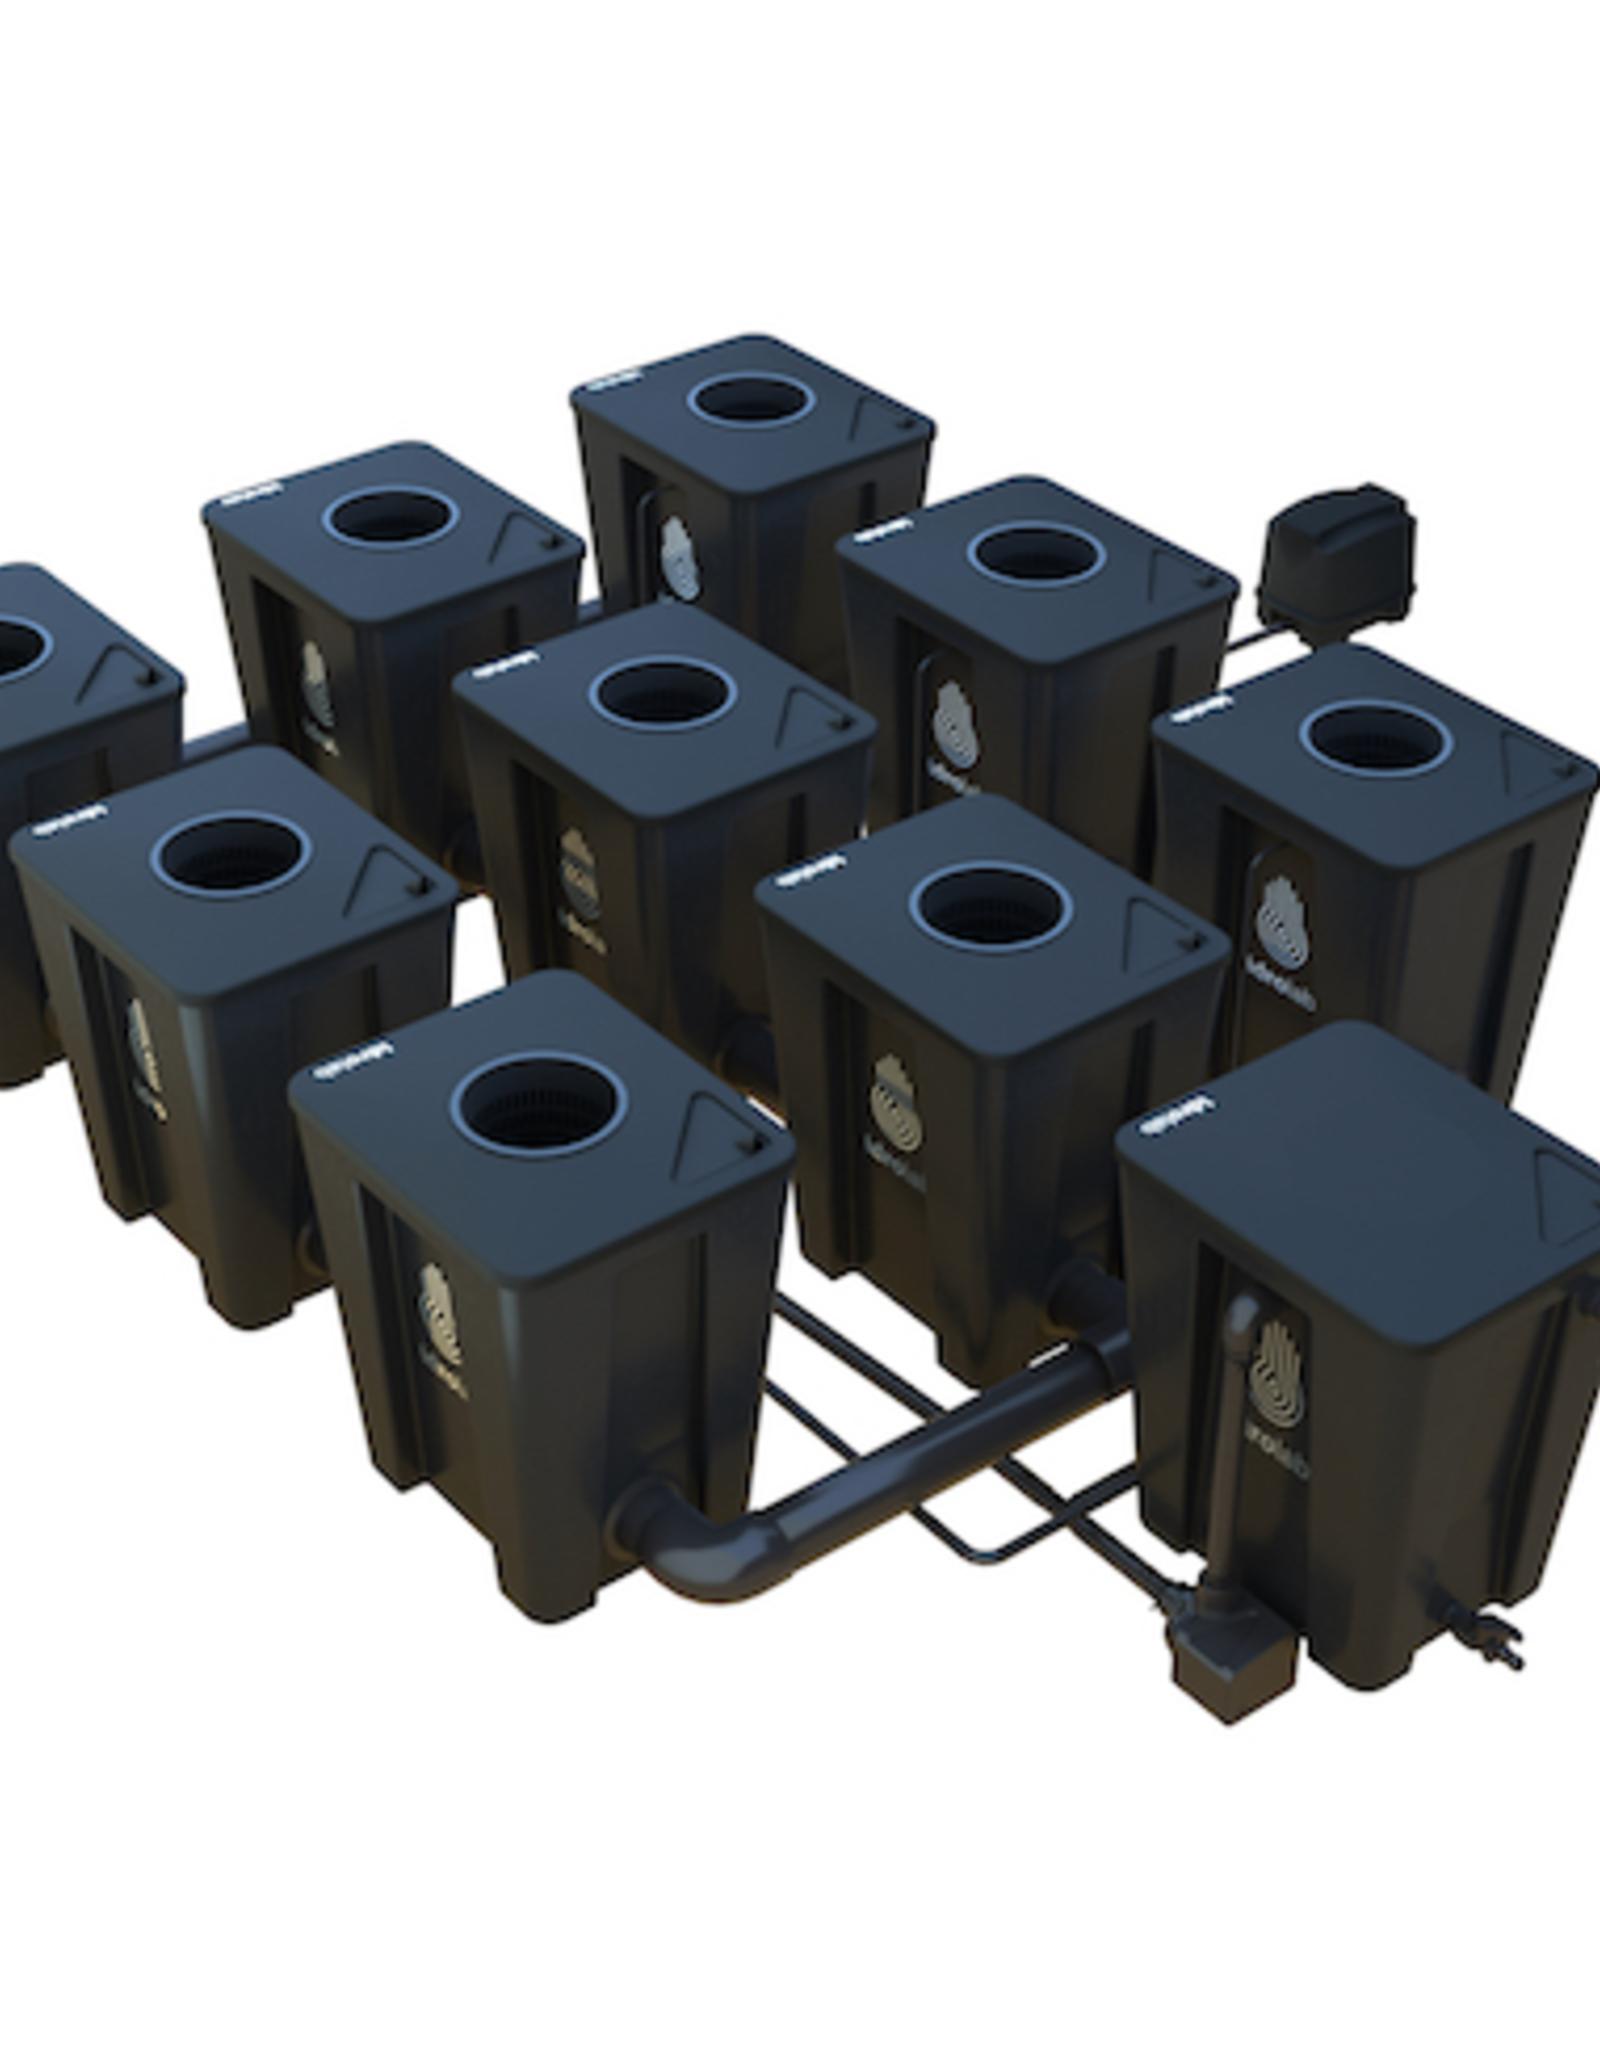 IDROLAB IDROLAB RDWC SYSTEM 3 LARGE 9+1